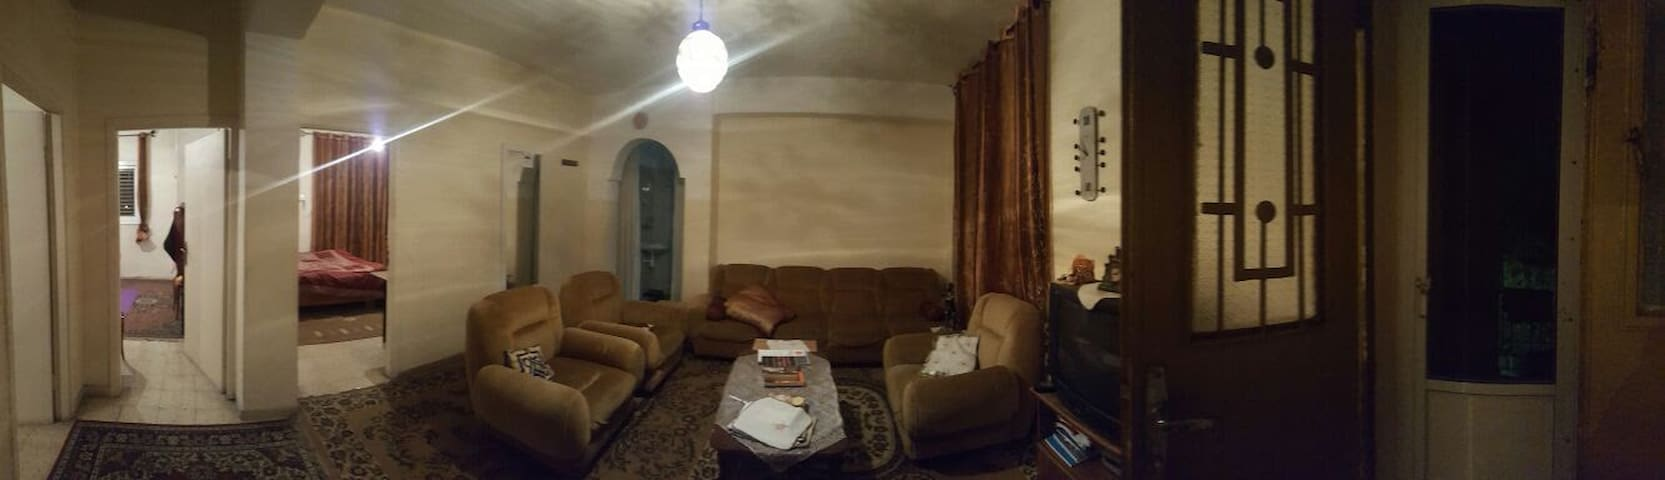 Furnished big apartment in Bethlehem